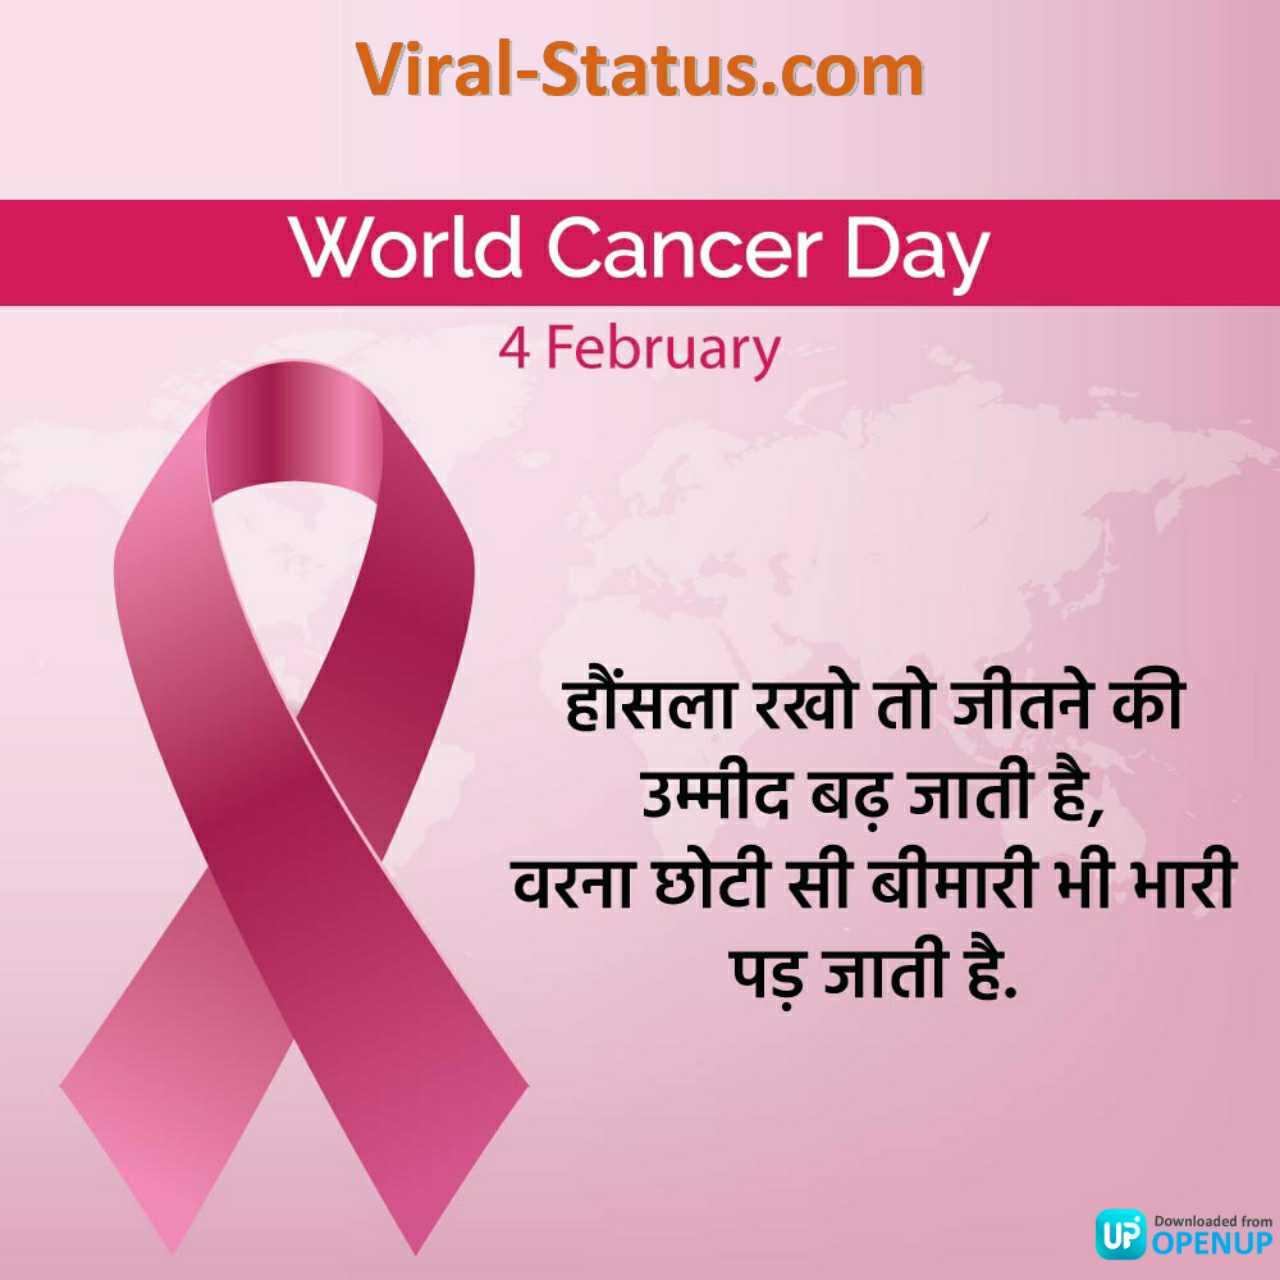 world cancer day 4 february 2020